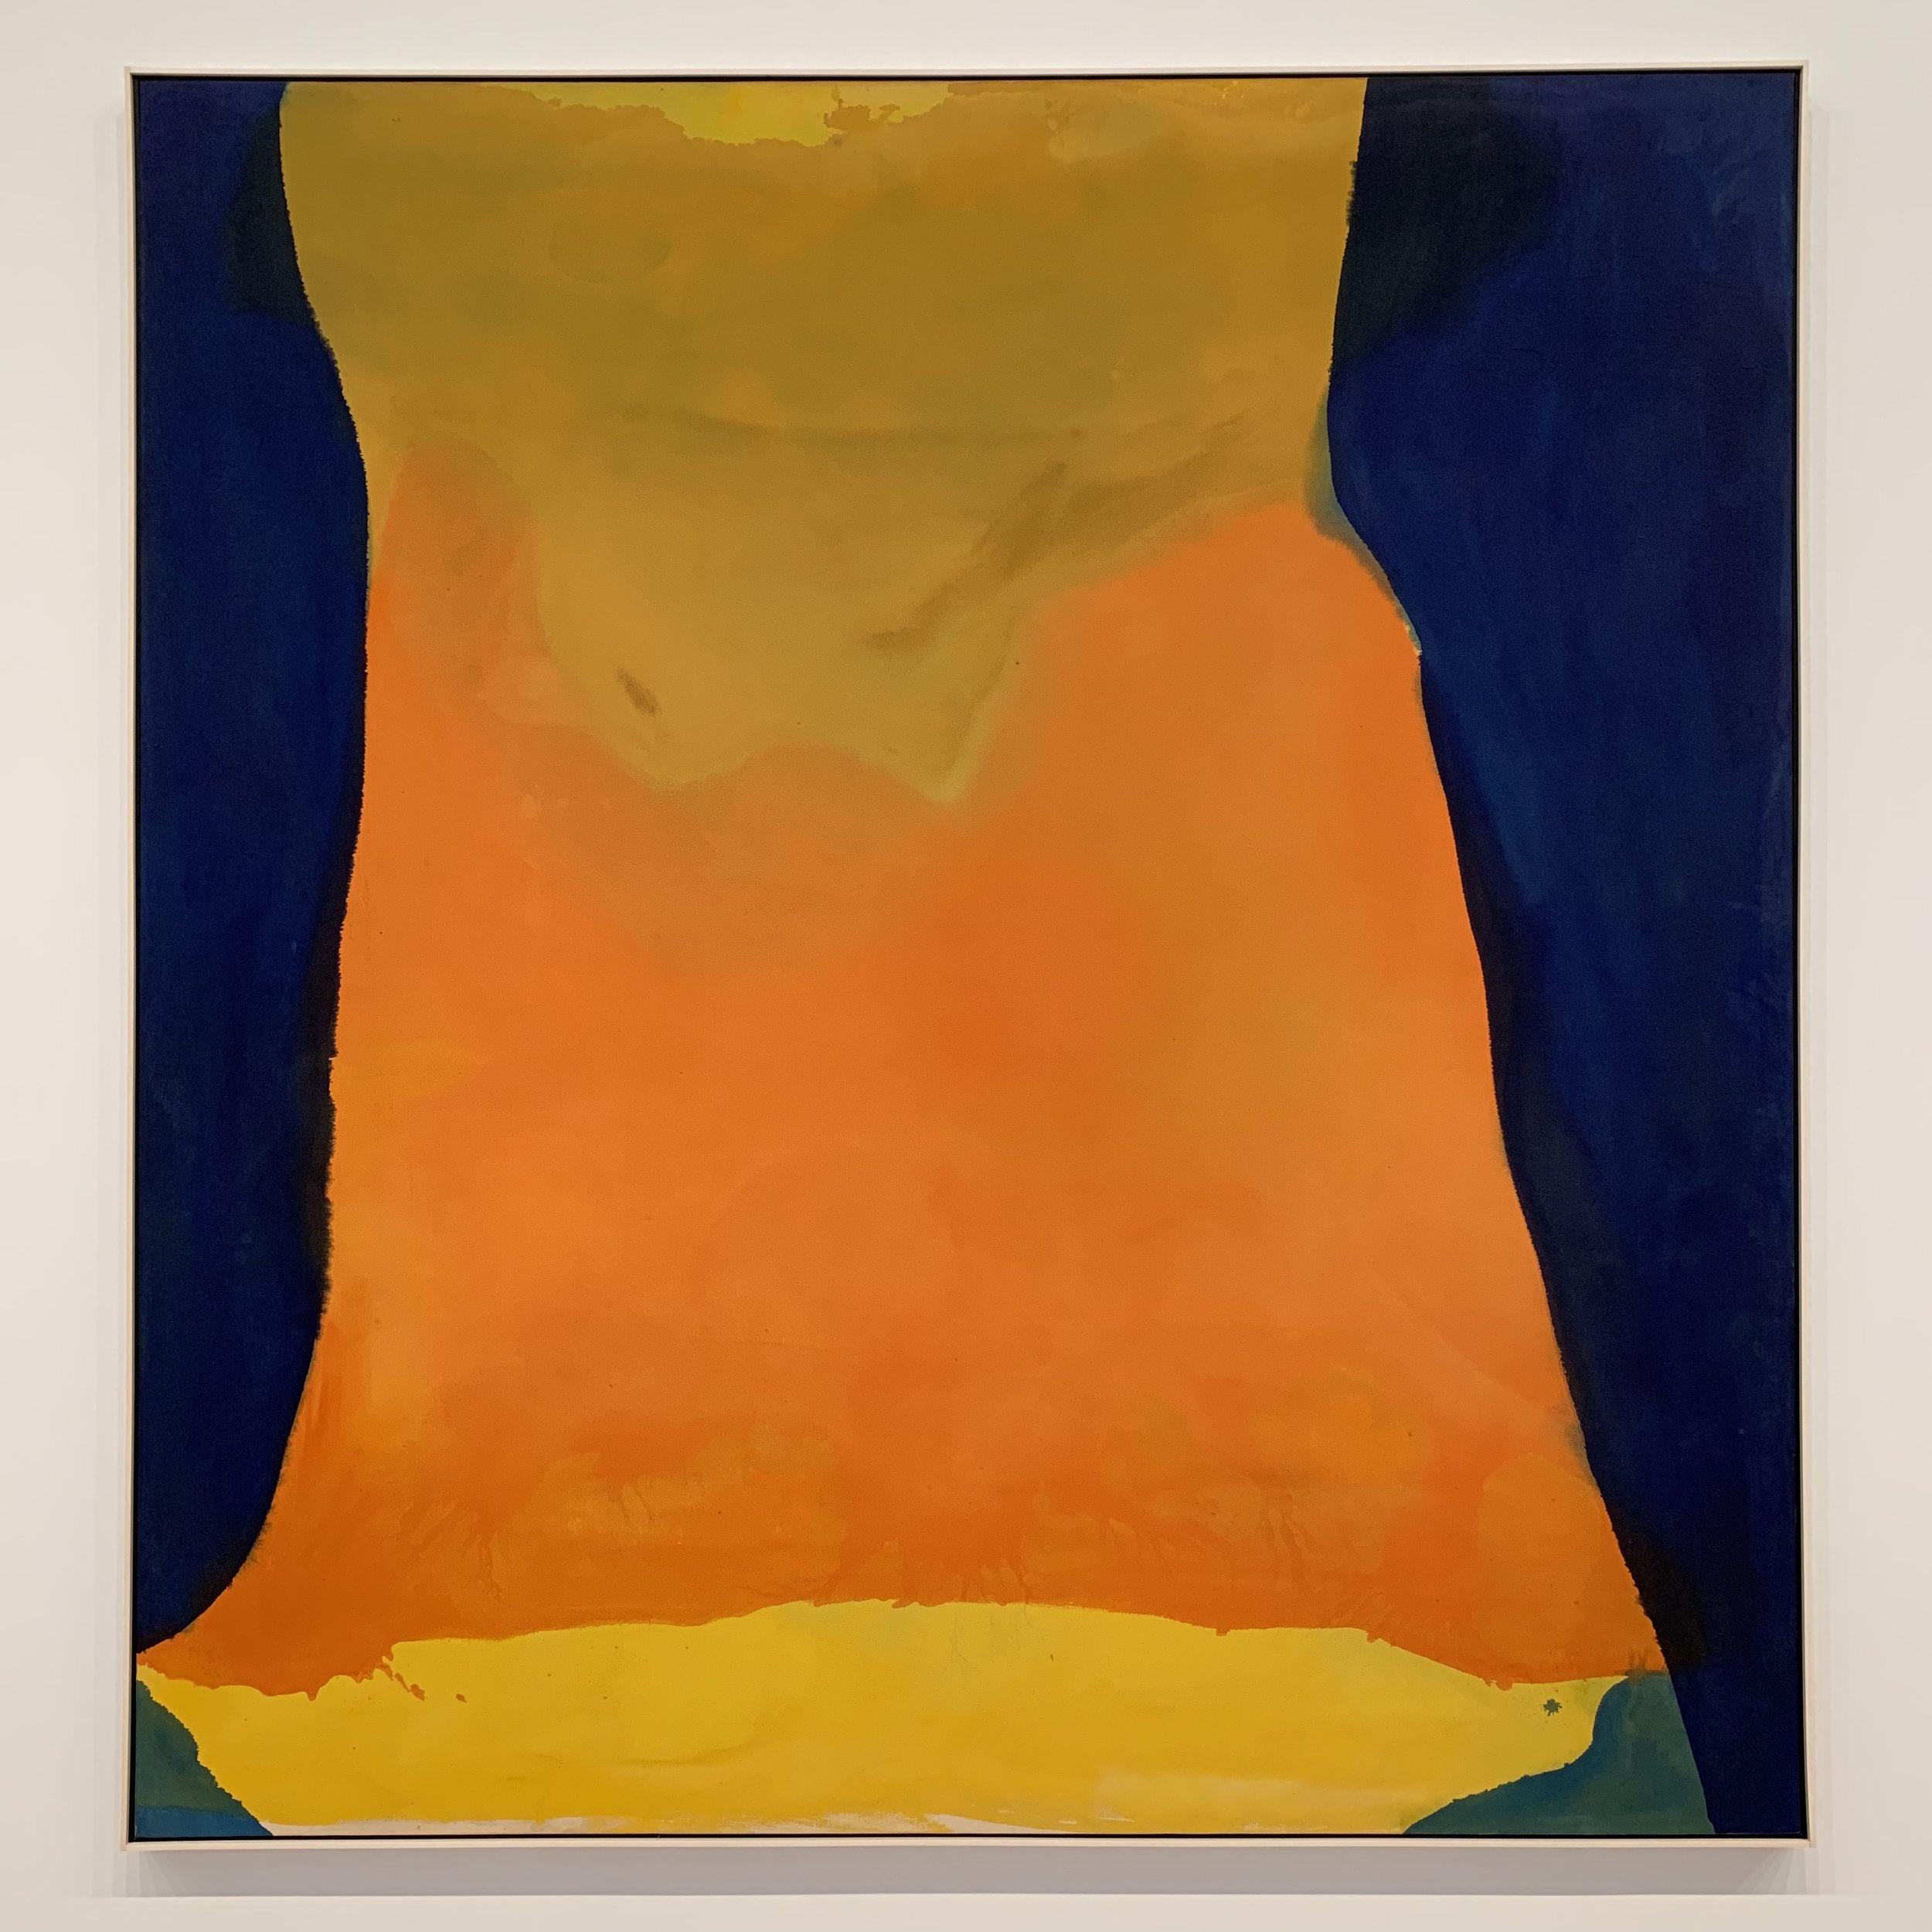 Helen Frankenthaler (1928-2011), Orange Mood, 1966, acrylic on canvas.